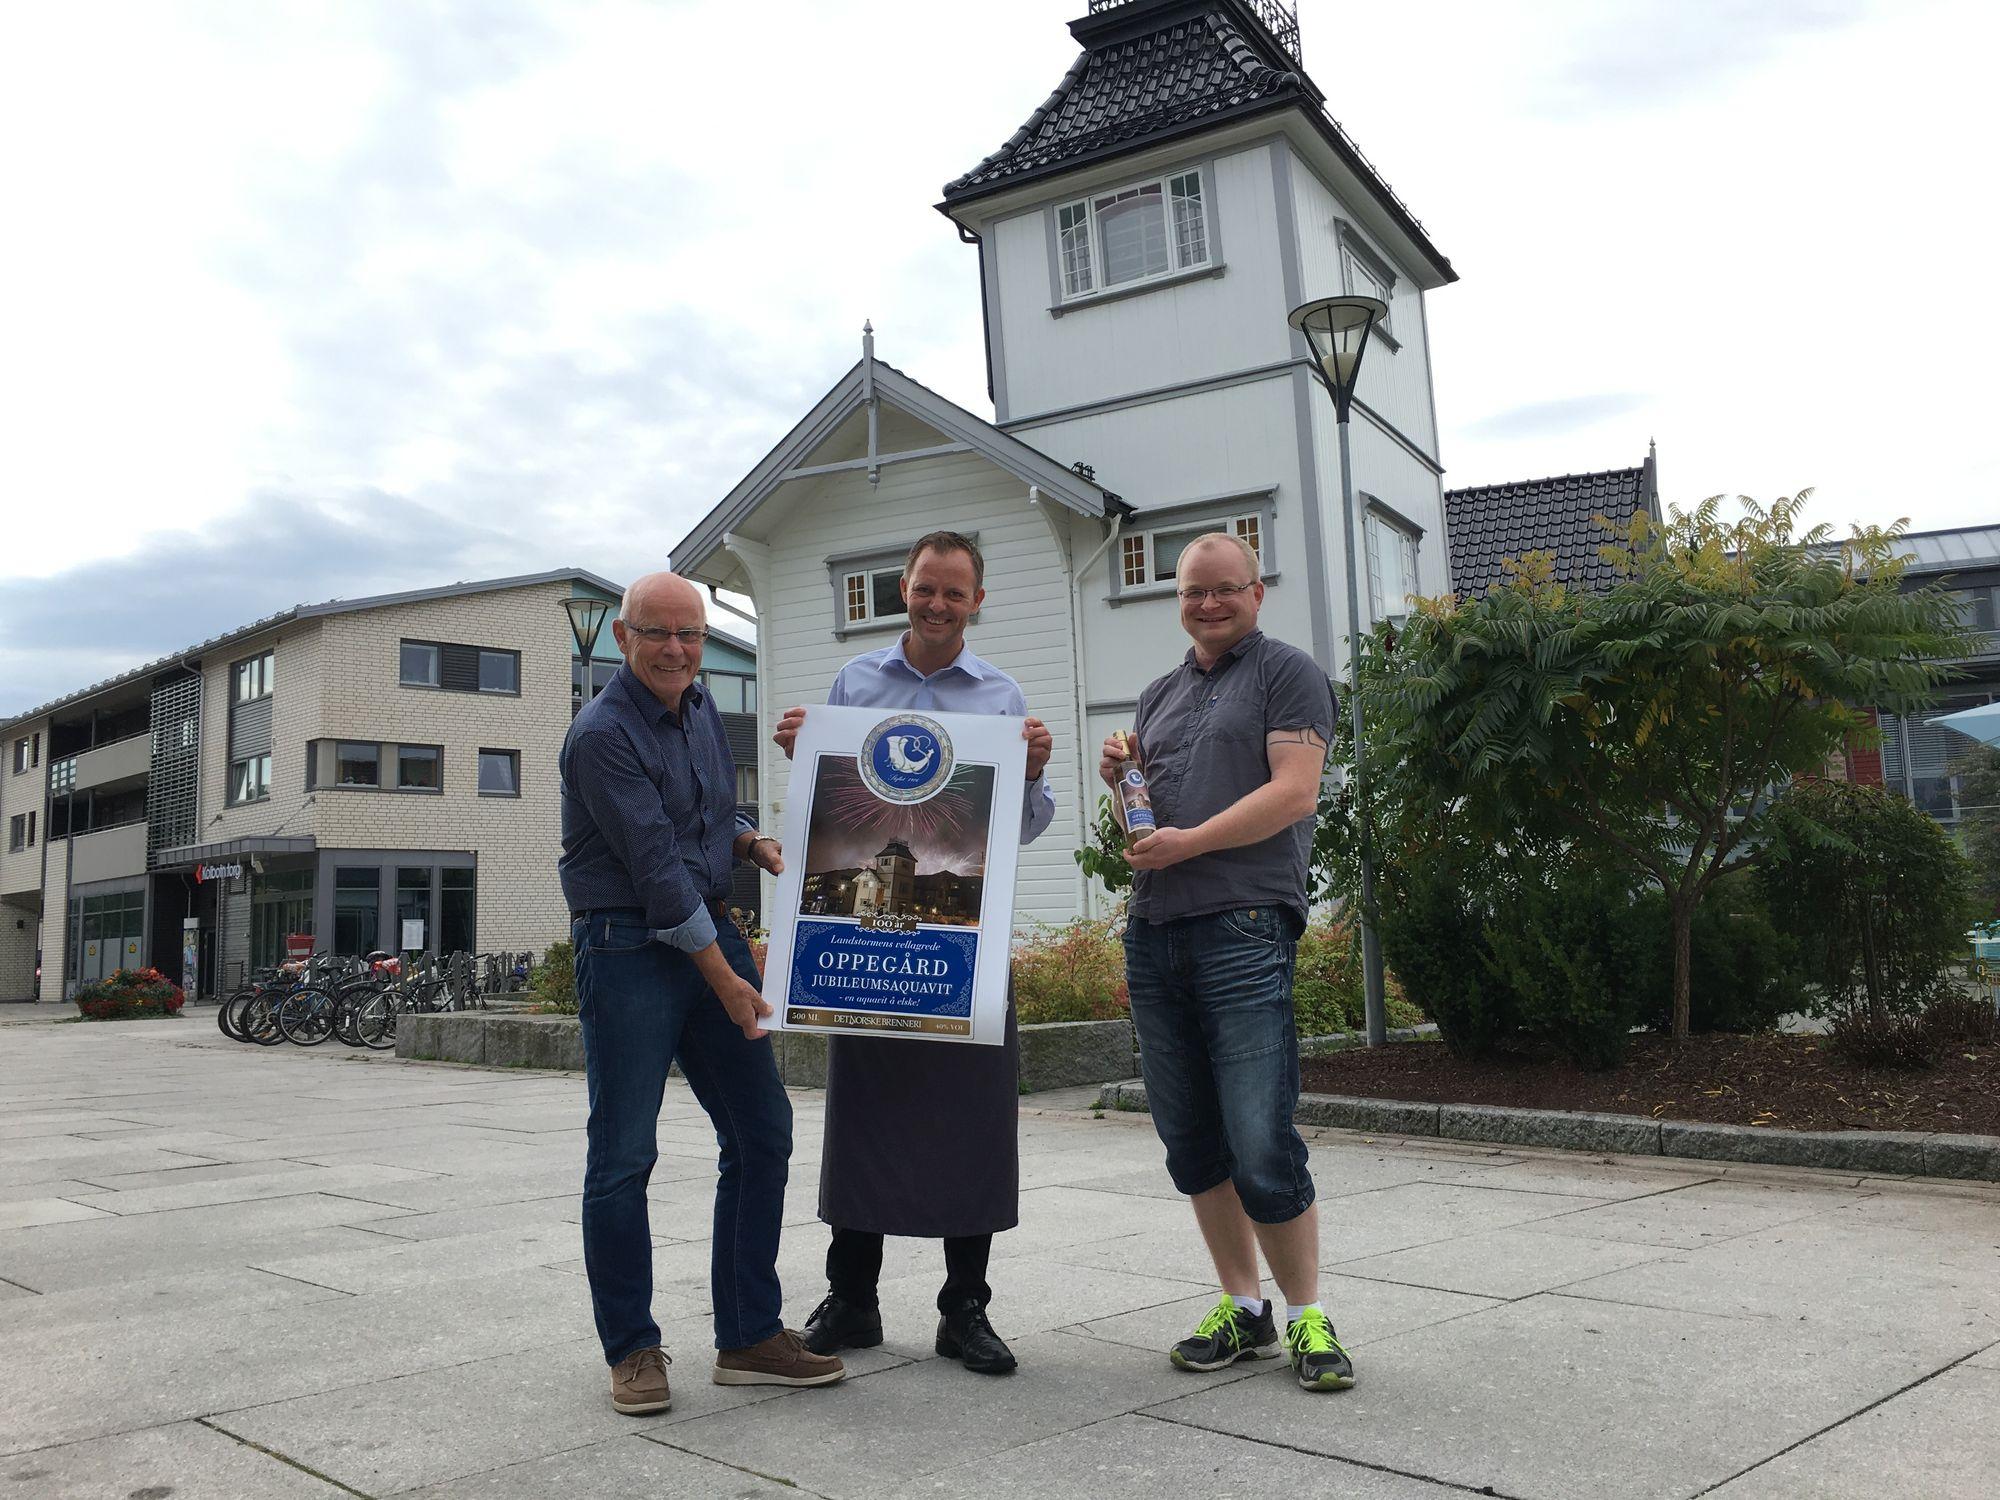 STOLTE: Torleif Bjøntegaard i Landstormen (t.v.), Vebjørn Aarflot fra Tårnhuset og fotograf Thomas Telstø Hysvær viser frem etiketten på Oppegård-akevitten.